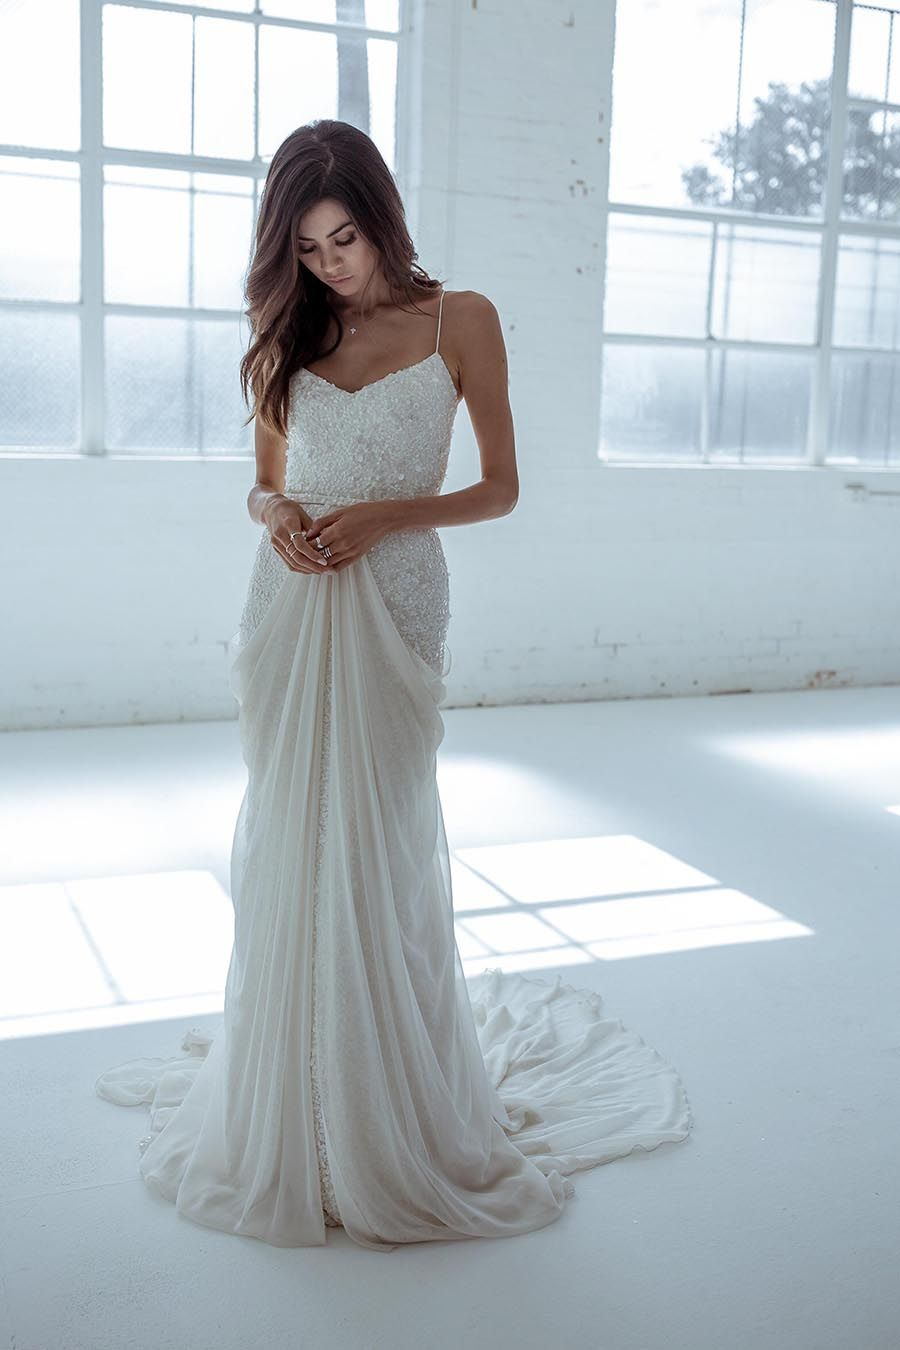 12 Stunning Wedding Dresses For Non Traditional Singapore Brides Wedding Dresses Alternative Wedding Dresses Wedding Dresses With Straps